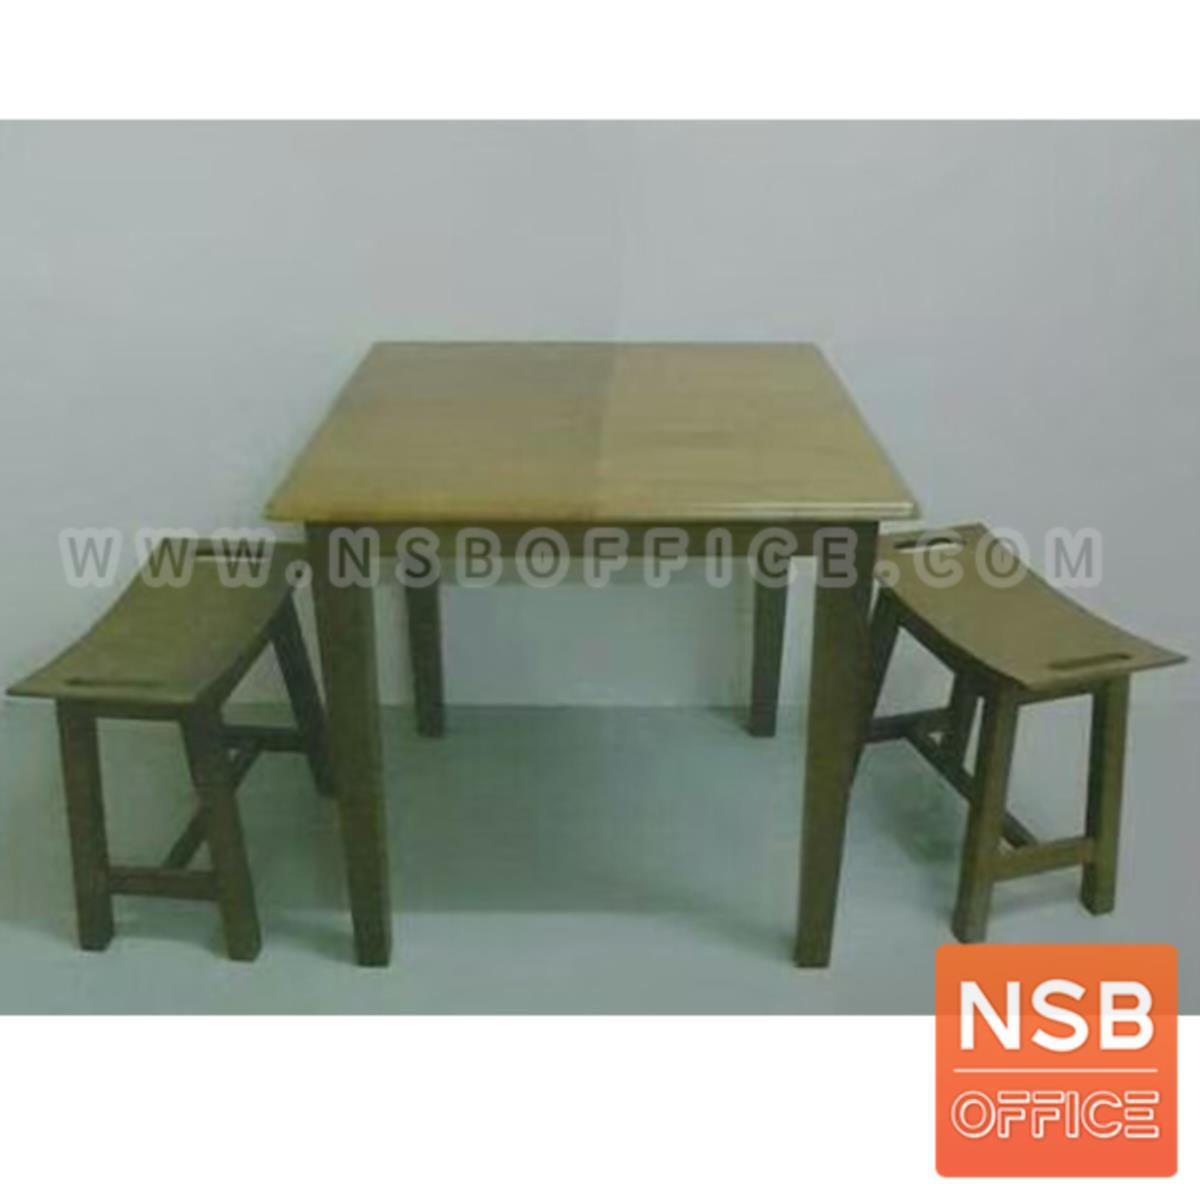 G20A017:ชุดโต๊ะและเก้าอี้อาหารเหลี่ยม รุ่น Demon (เดมอน) 2 ที่นั่ง